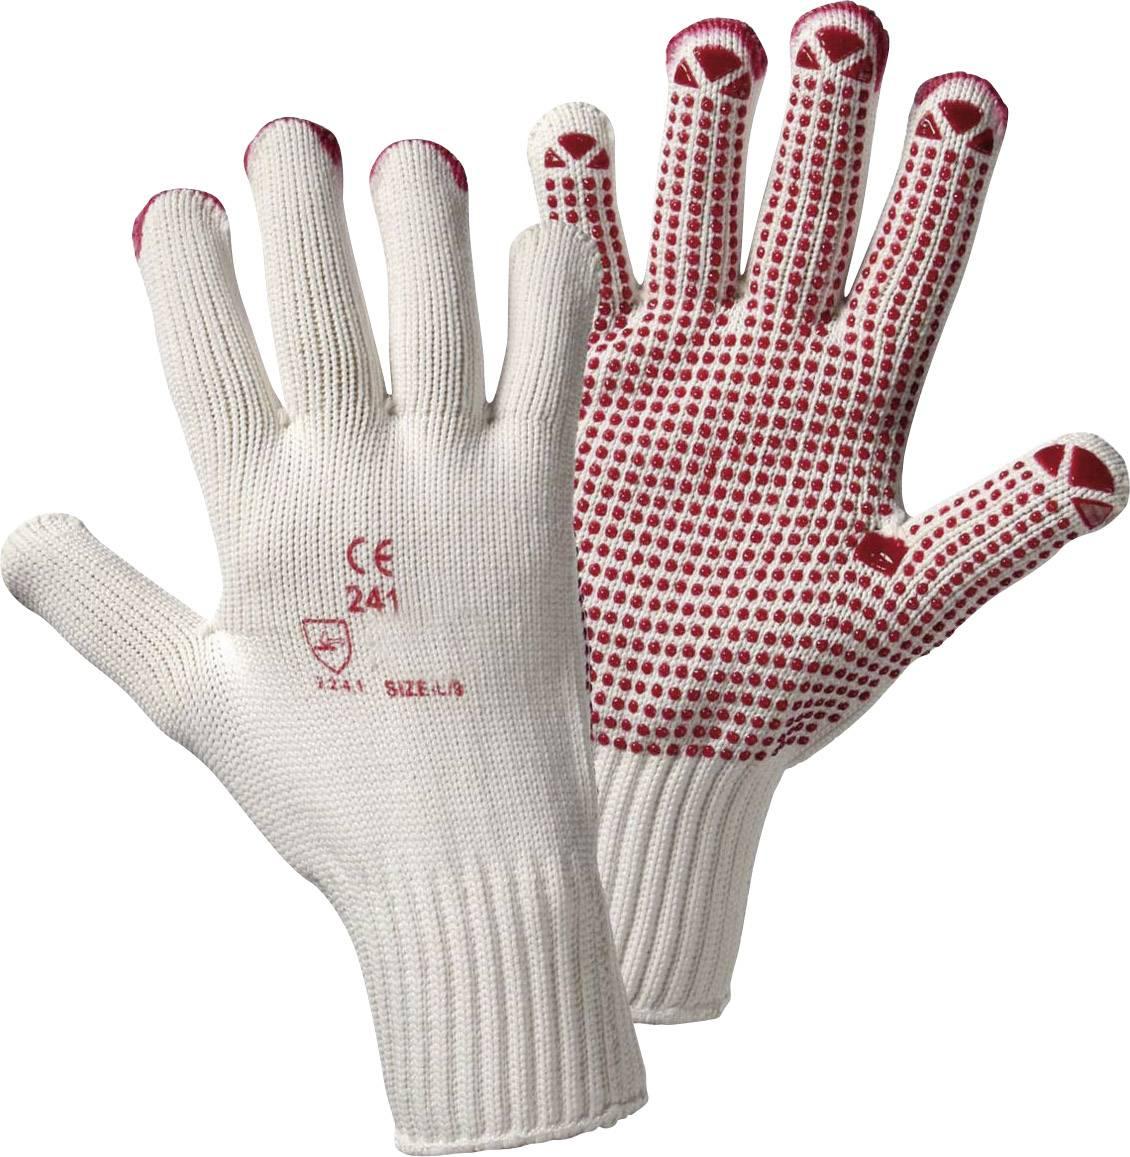 Worky Puncto 1130, velikost rukavic: 7, S